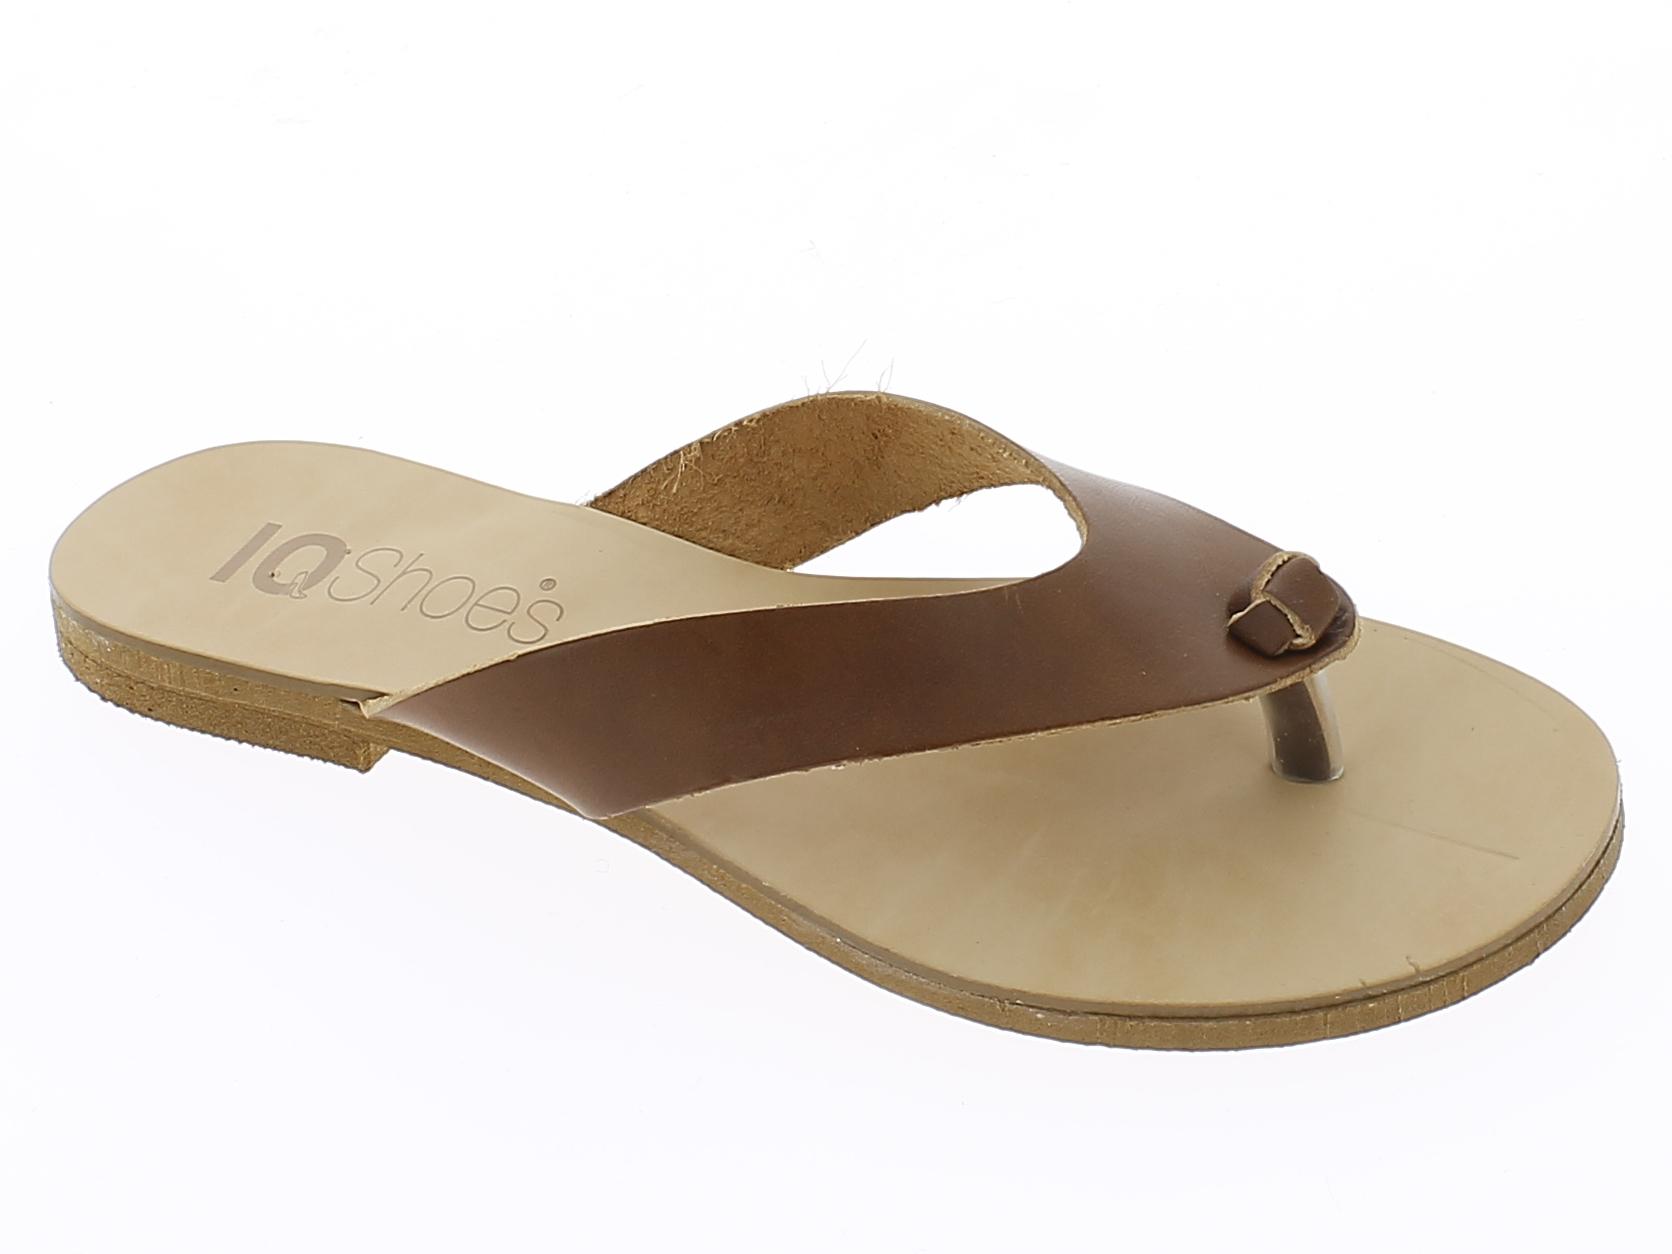 IQSHOES Γυναικείο Σανδάλι T184-07 Καφέ - IqShoes - T184-07 BAKETI brown 35/1/24/ παπούτσια  γυναικεία σανδάλια   πέδιλα